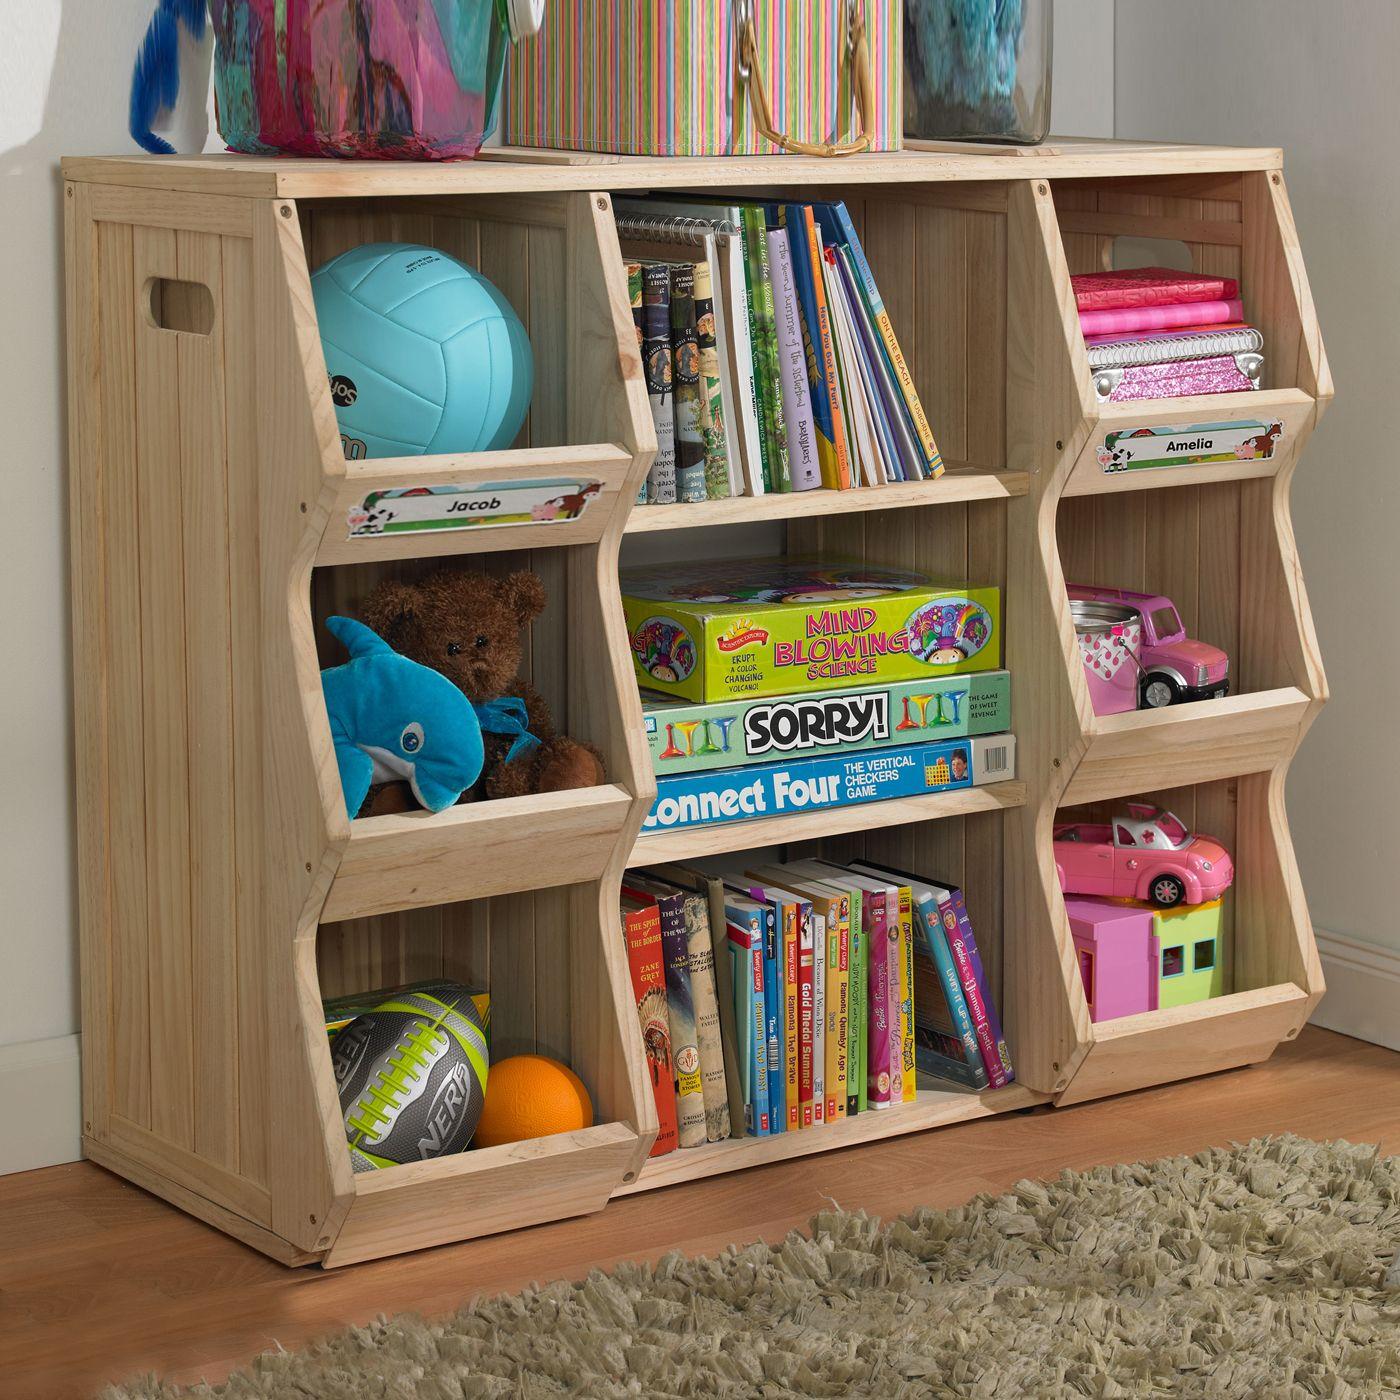 Merry Products Slf Children S Bookshelf Cubby